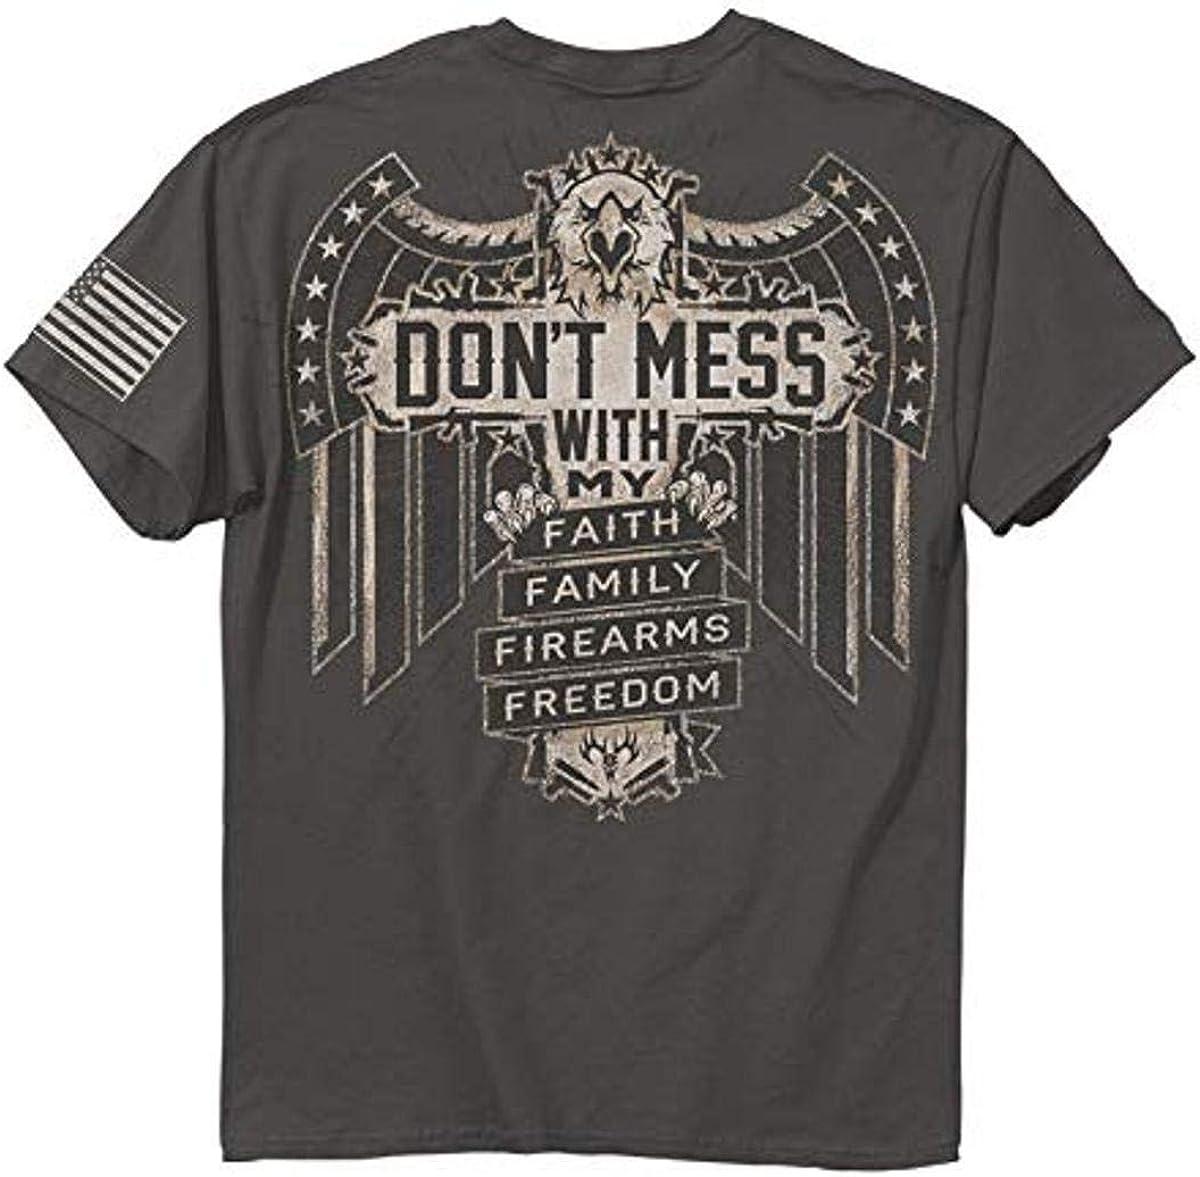 Buckwear Don't Mess T-Shirt, X-Large, Charcoal